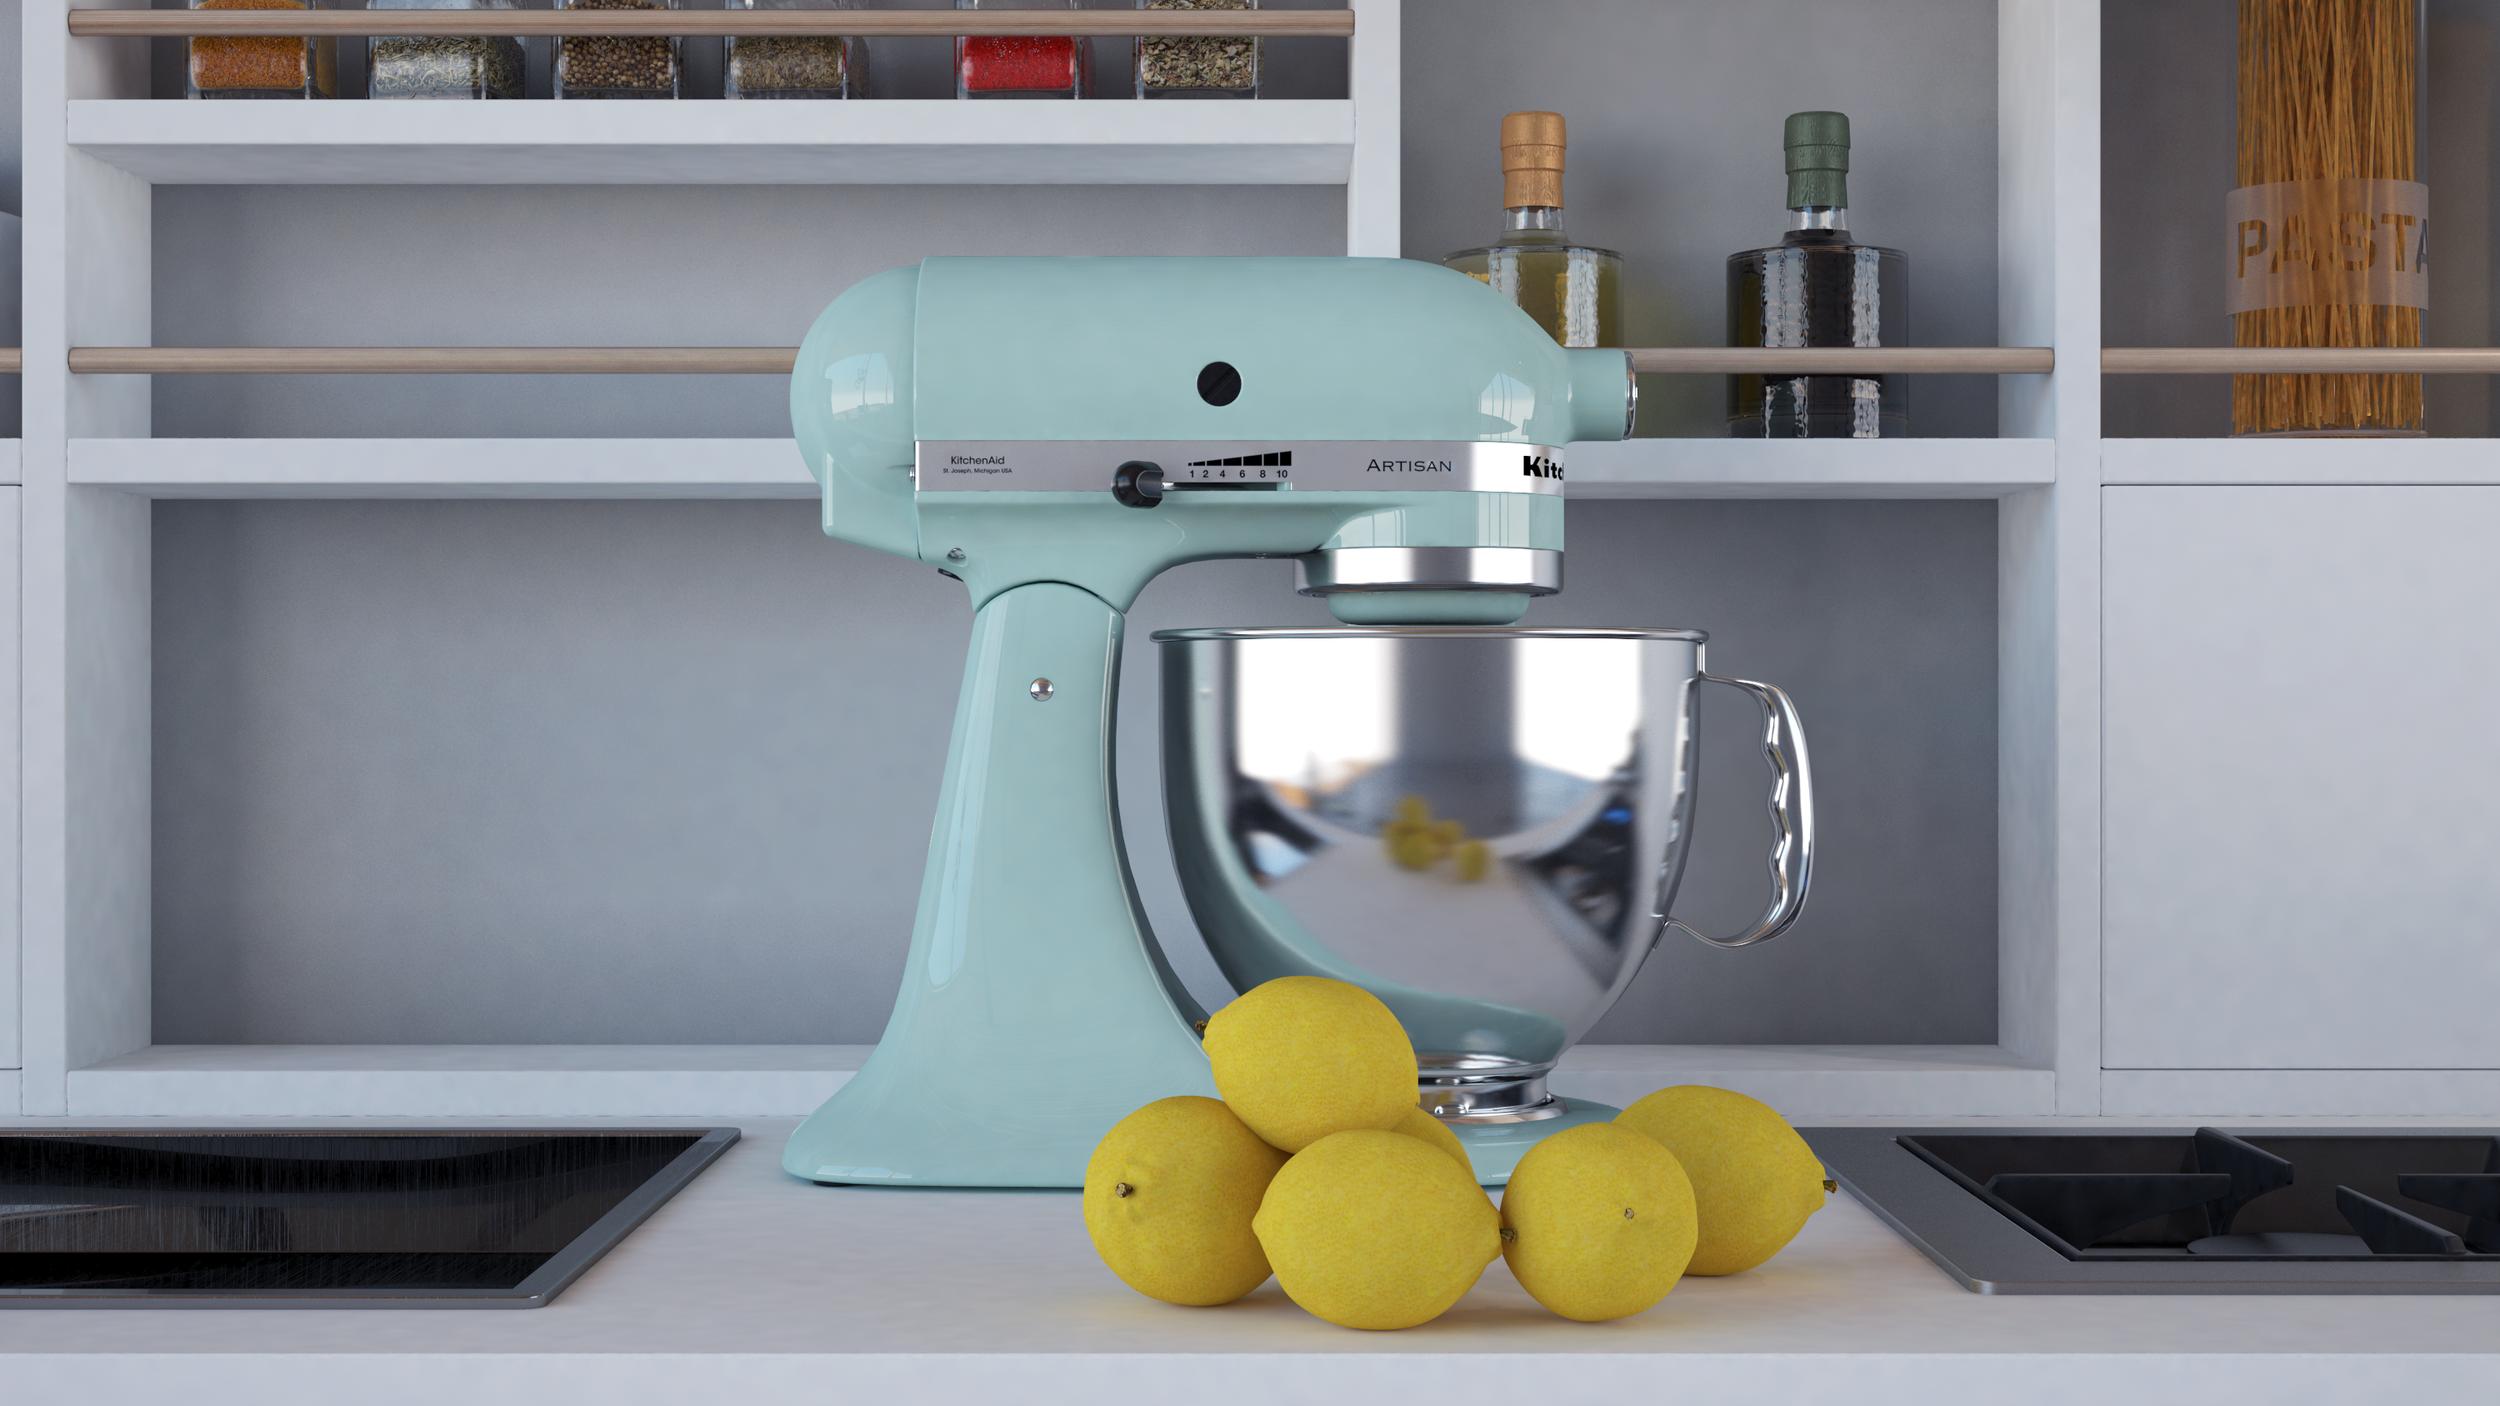 KitchenAid — Matthew Gould